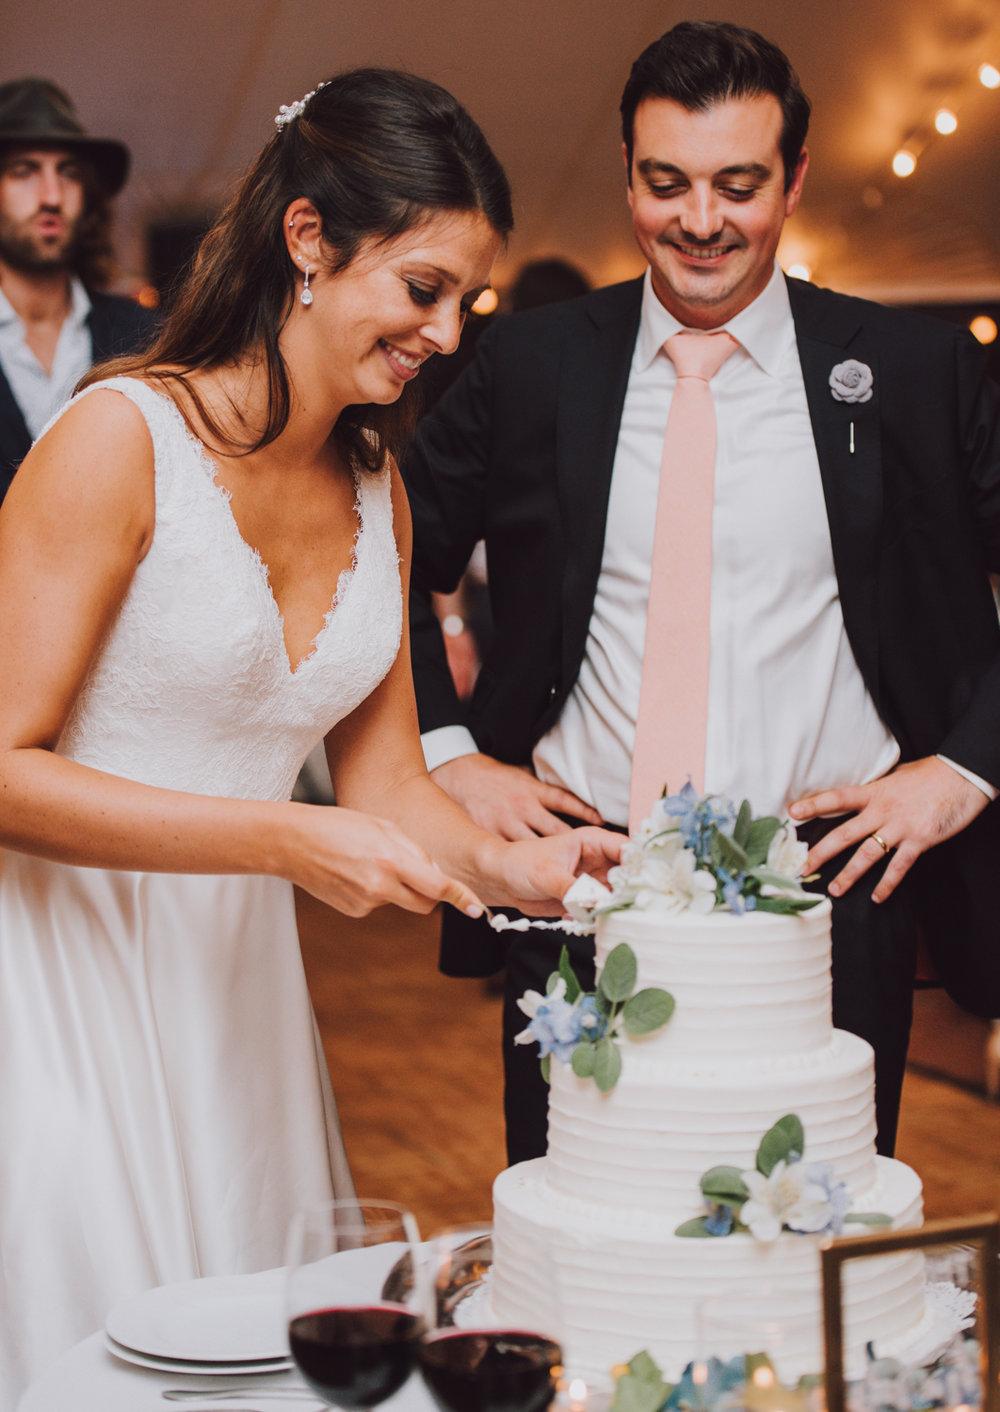 maureen_evan_wedding_cake_cutting_marthas_vineyard-0984.jpg